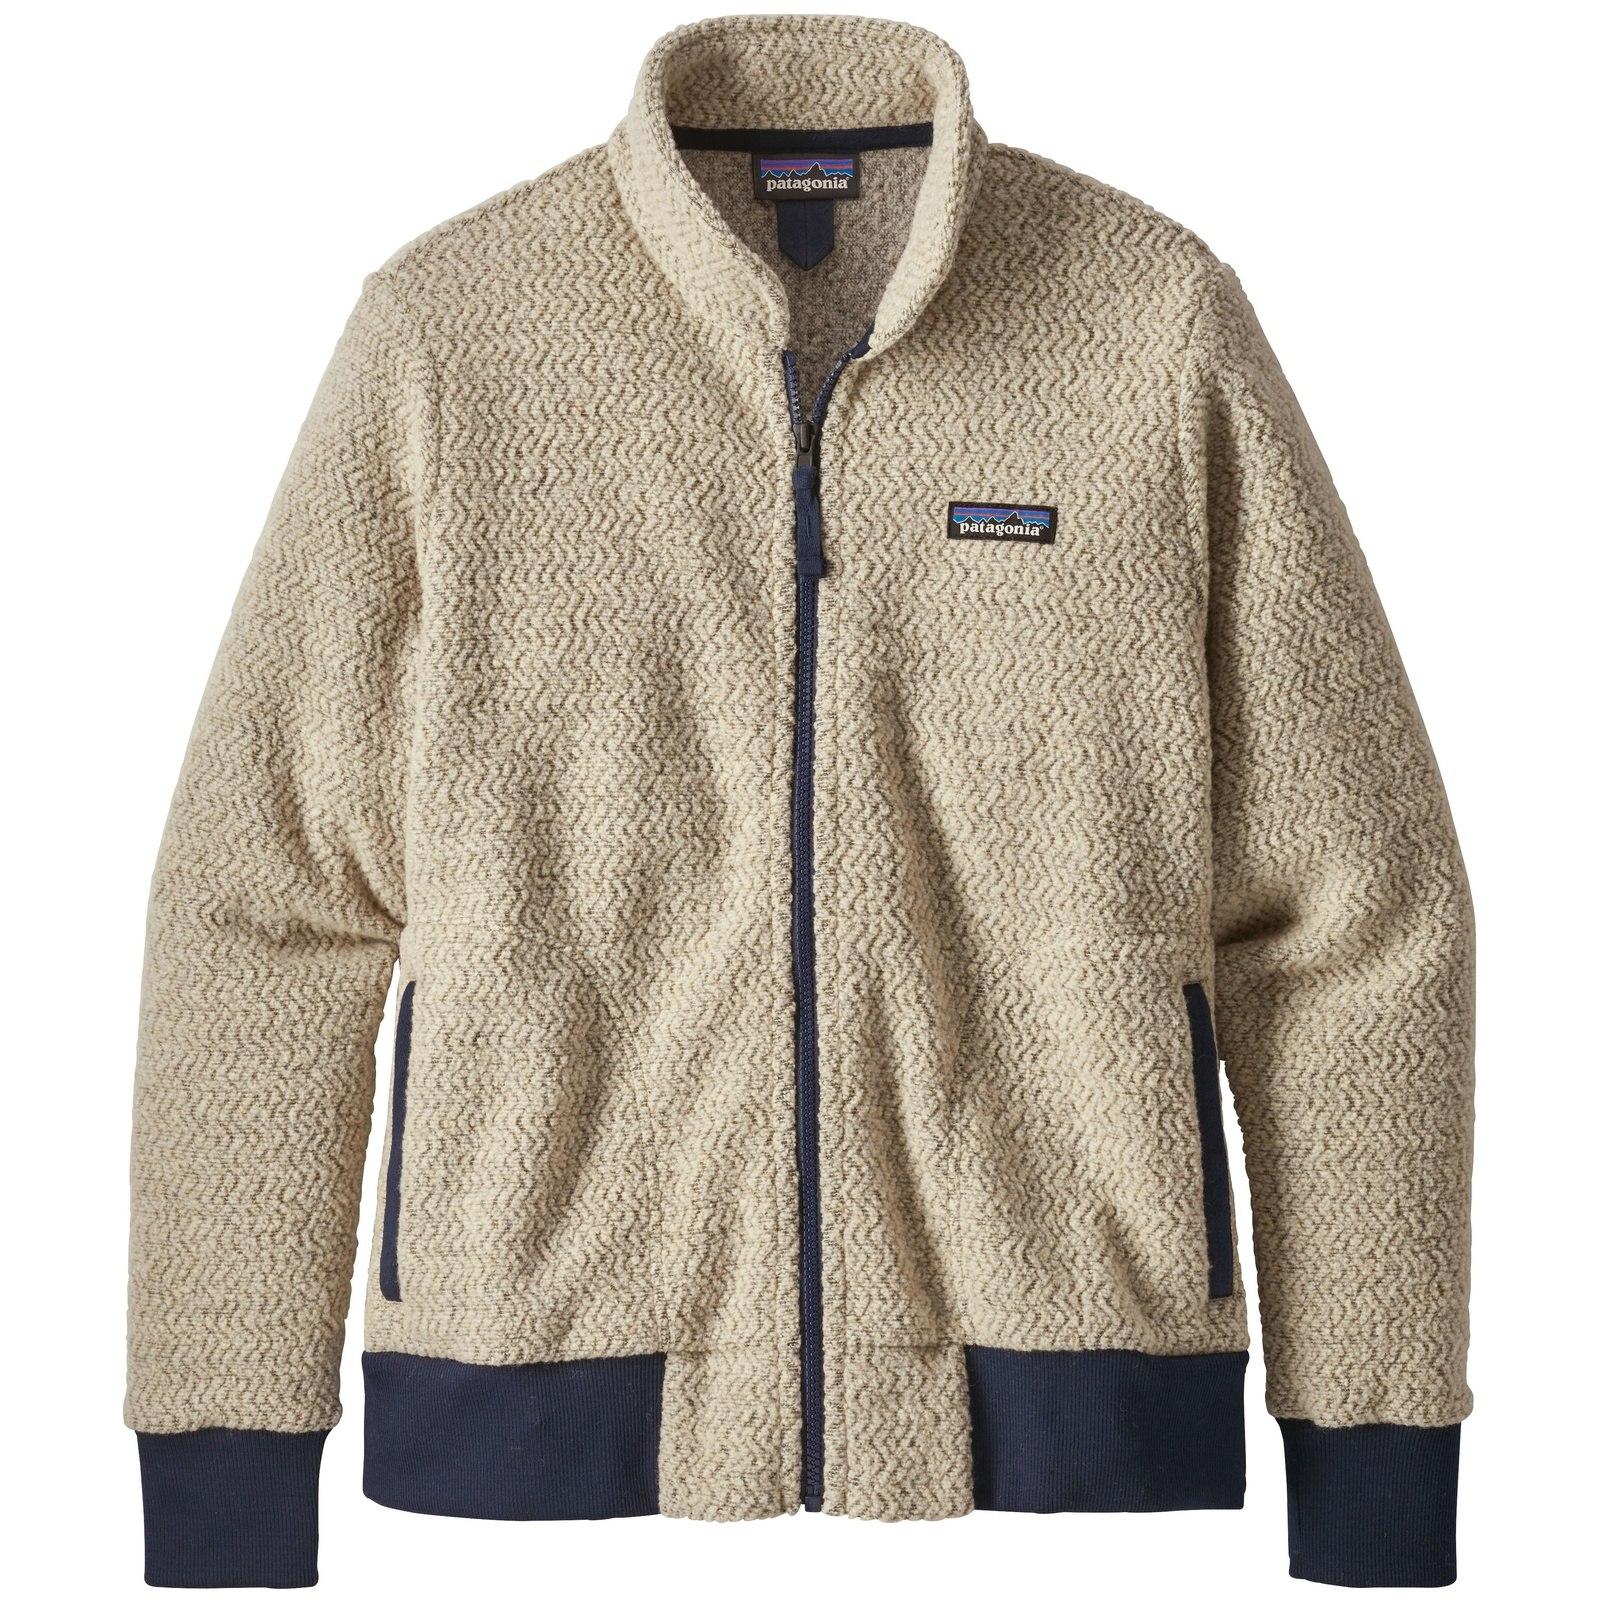 763274ba Patagonia Women's Woolyester Fleece Jacket on Sale | Powder7.com